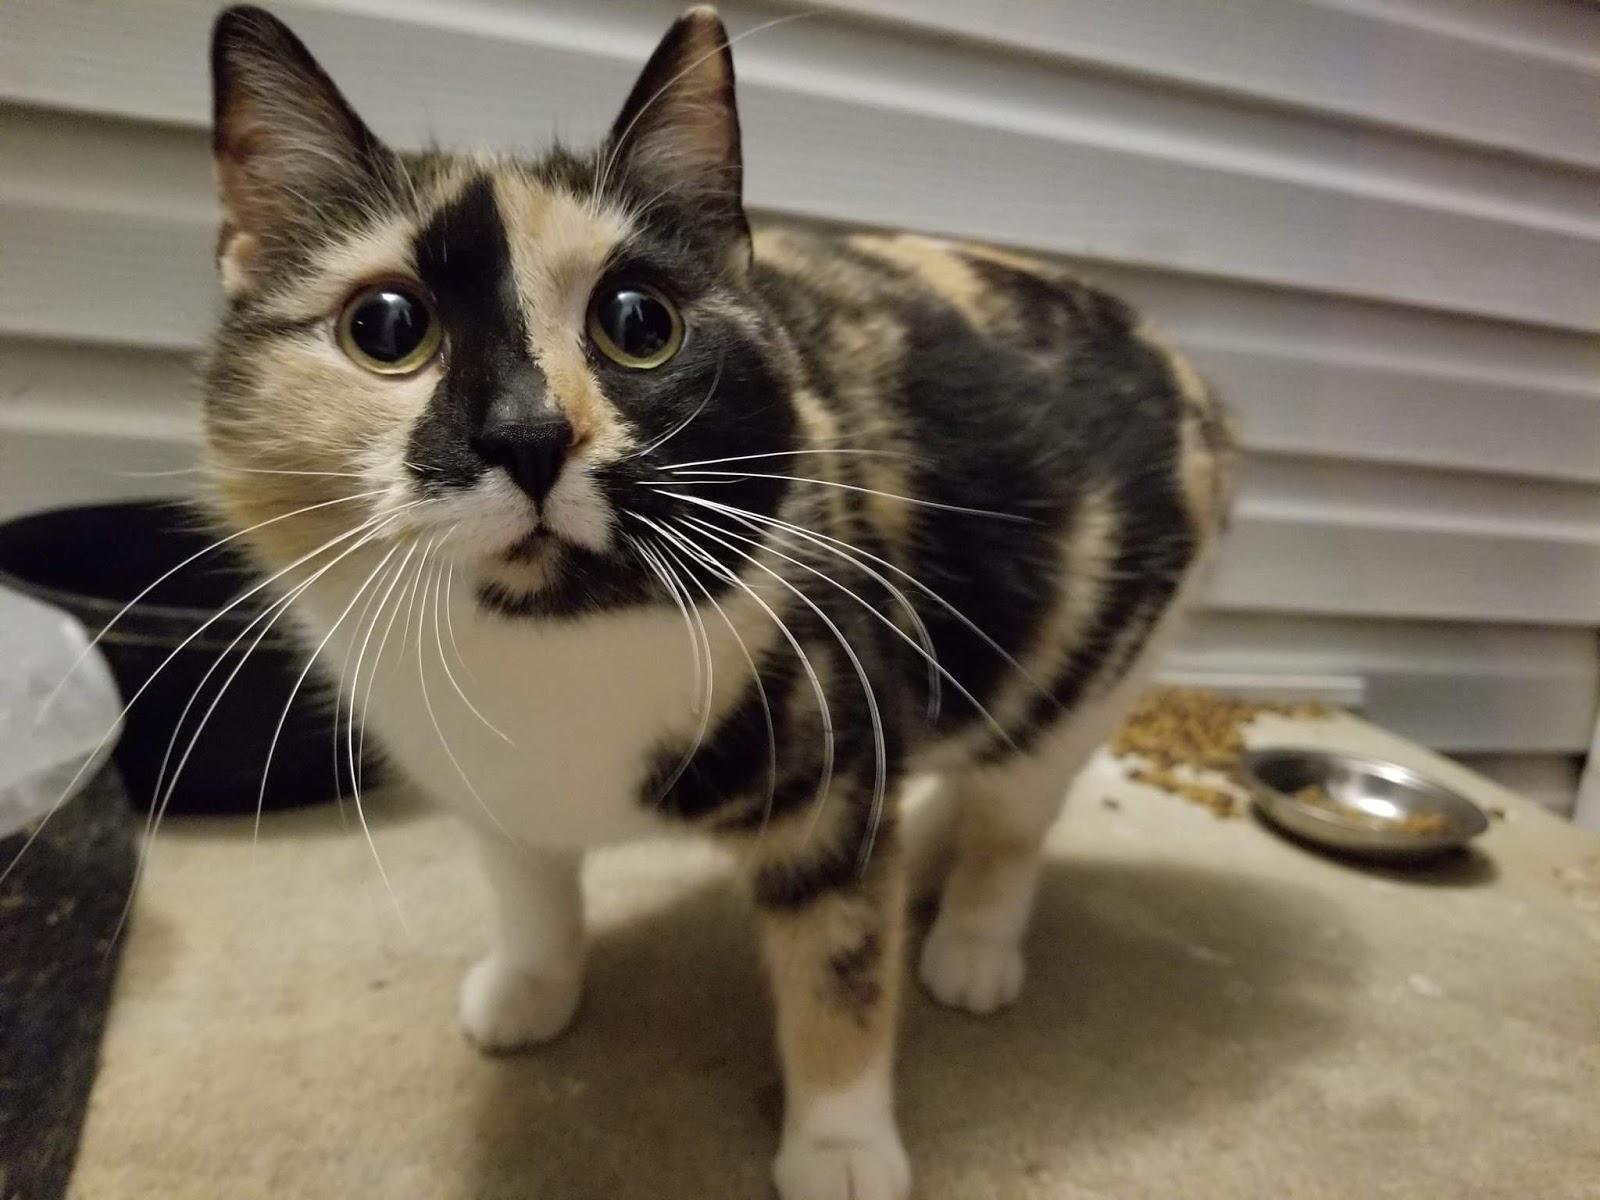 Funny cats - part 323, cute cat pictures, best cat photos